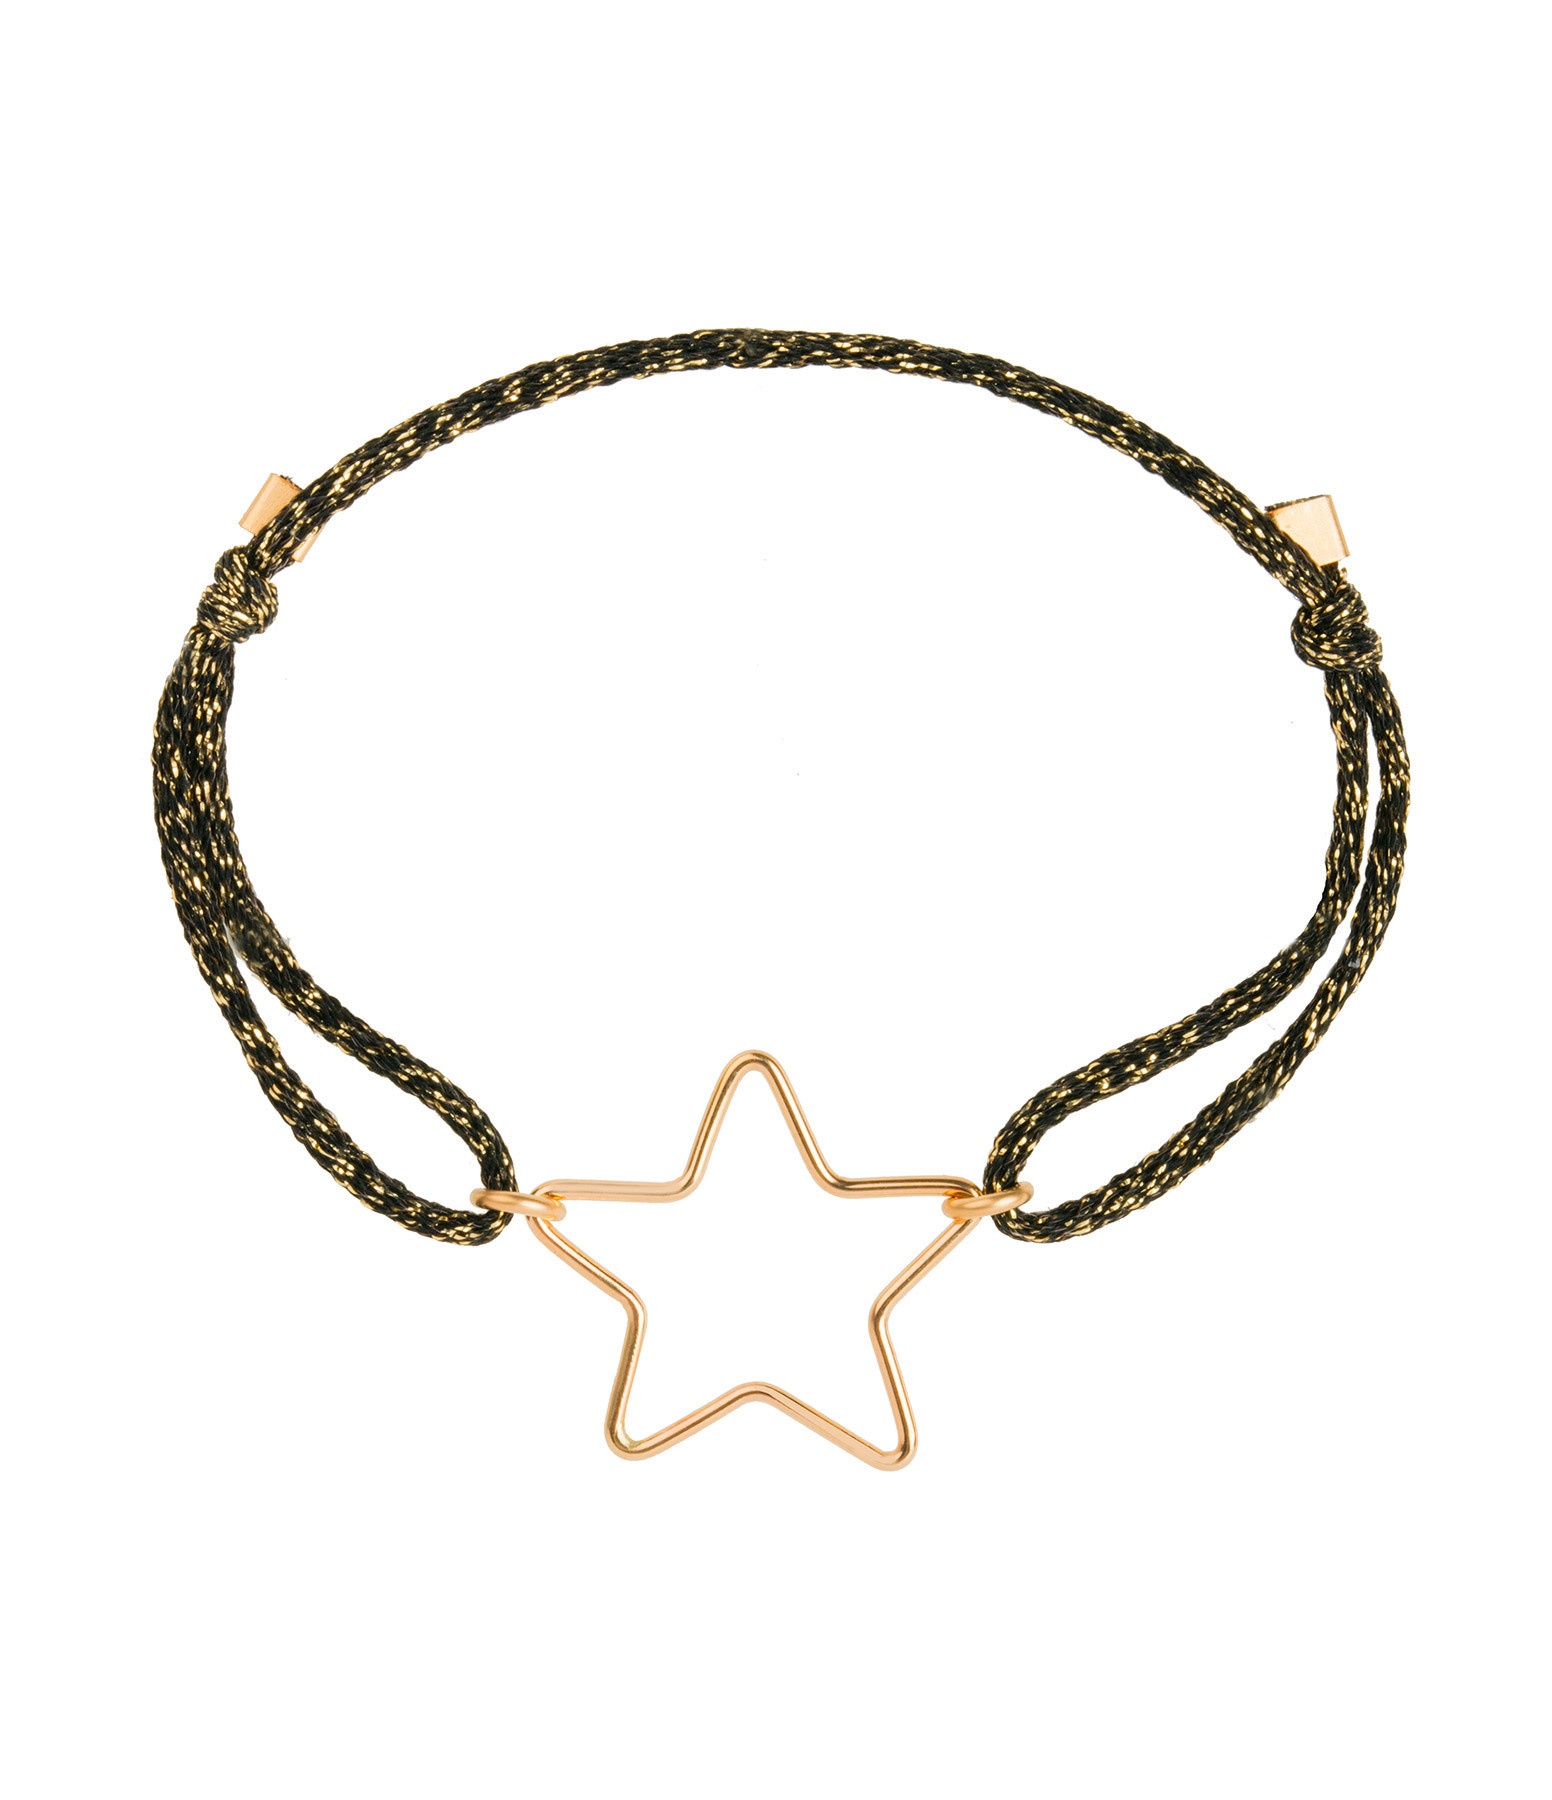 ATELIER PAULIN - Bracelet Cordon Stardust Petit Star Gold Filled 14K